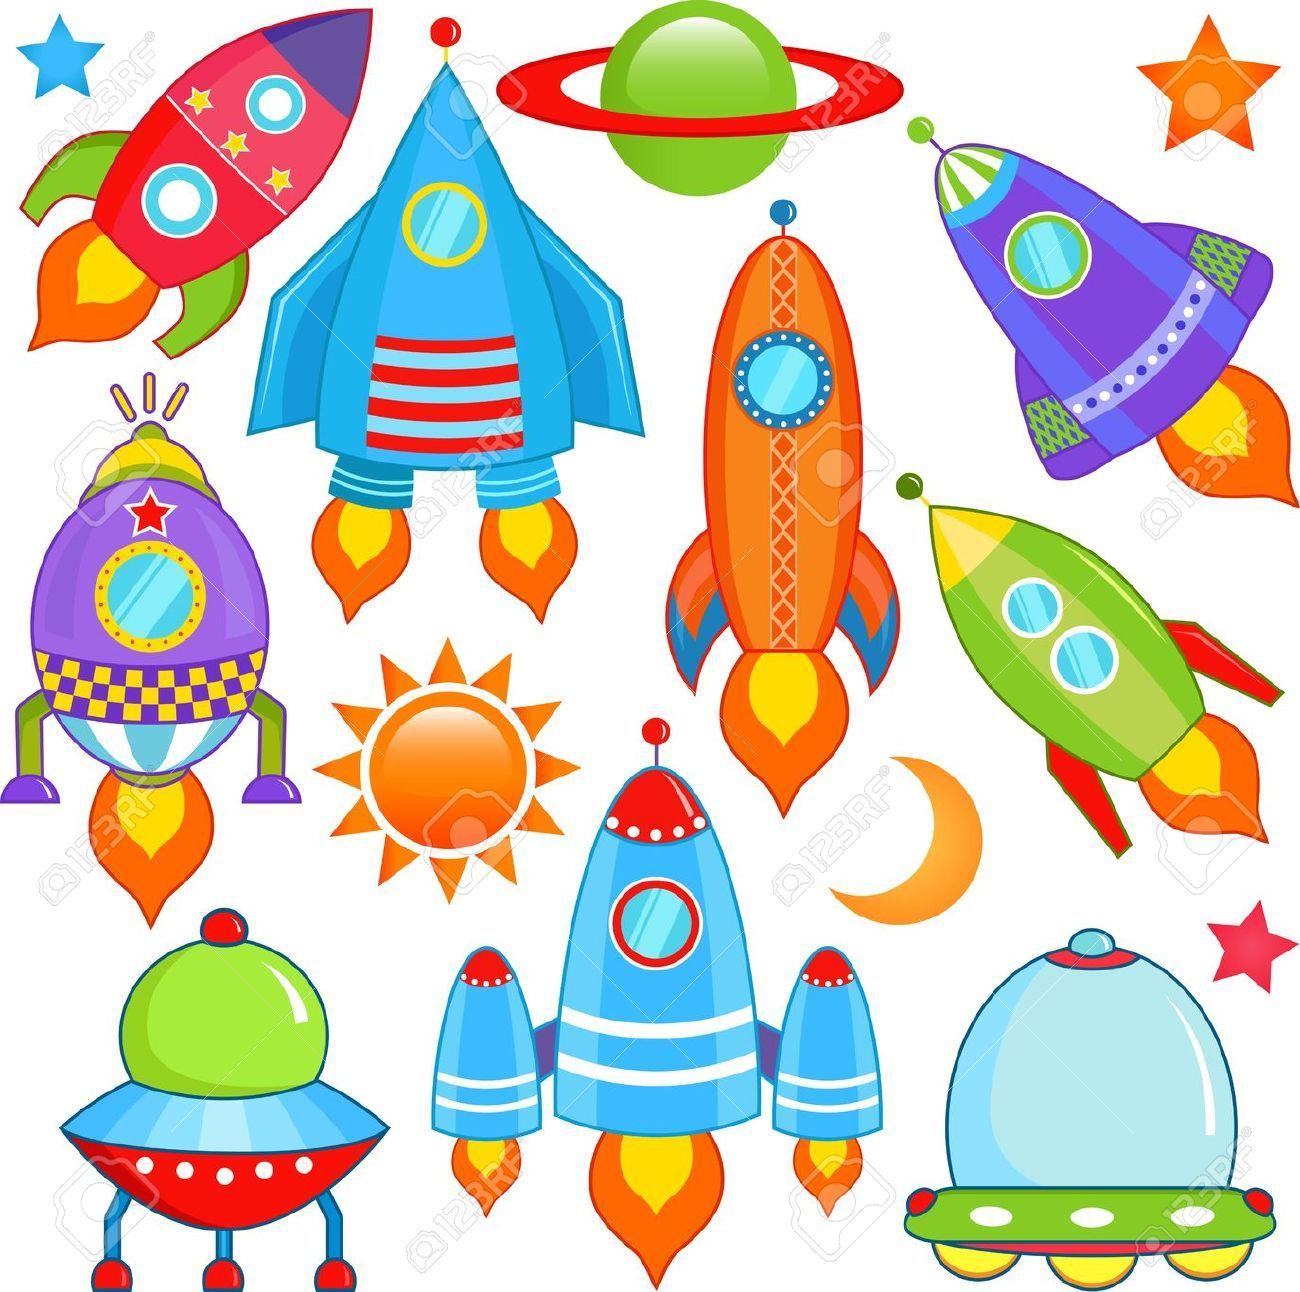 dibujos de nave espacial de buzz lightyear para imprimir buscar